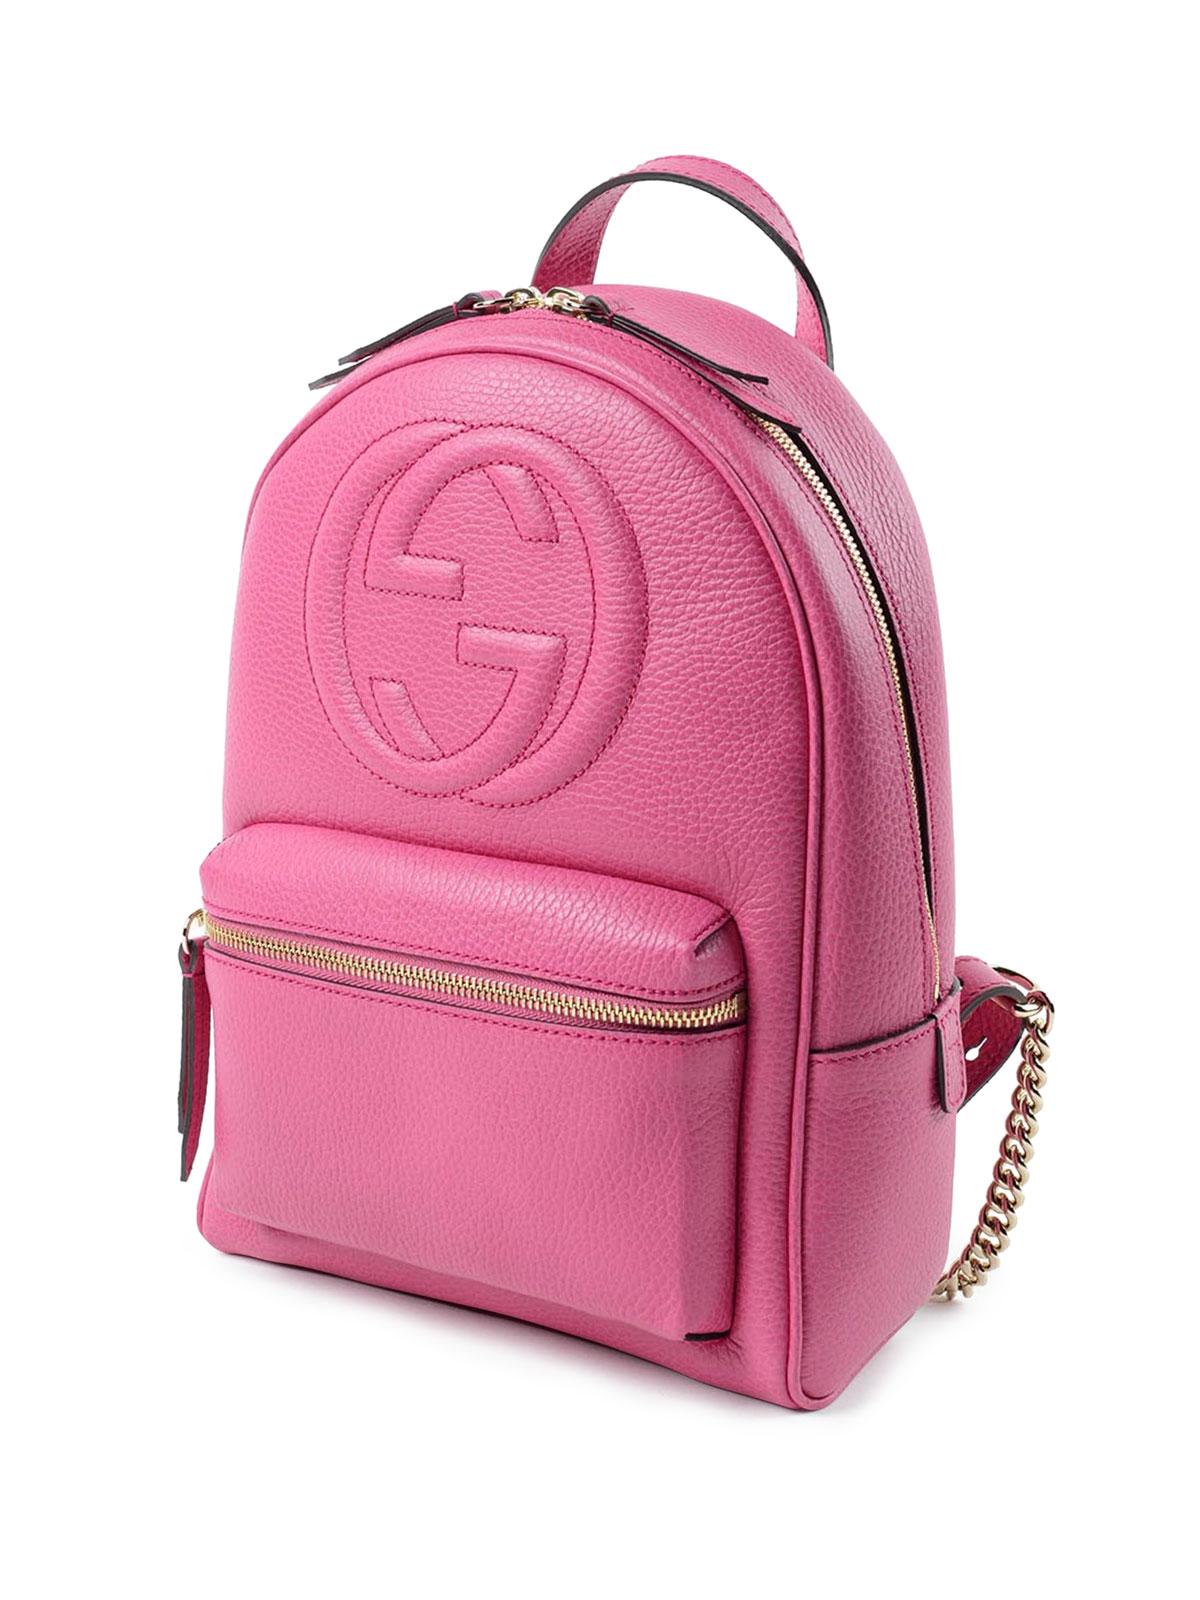 Soho dollar calf backpack by Gucci